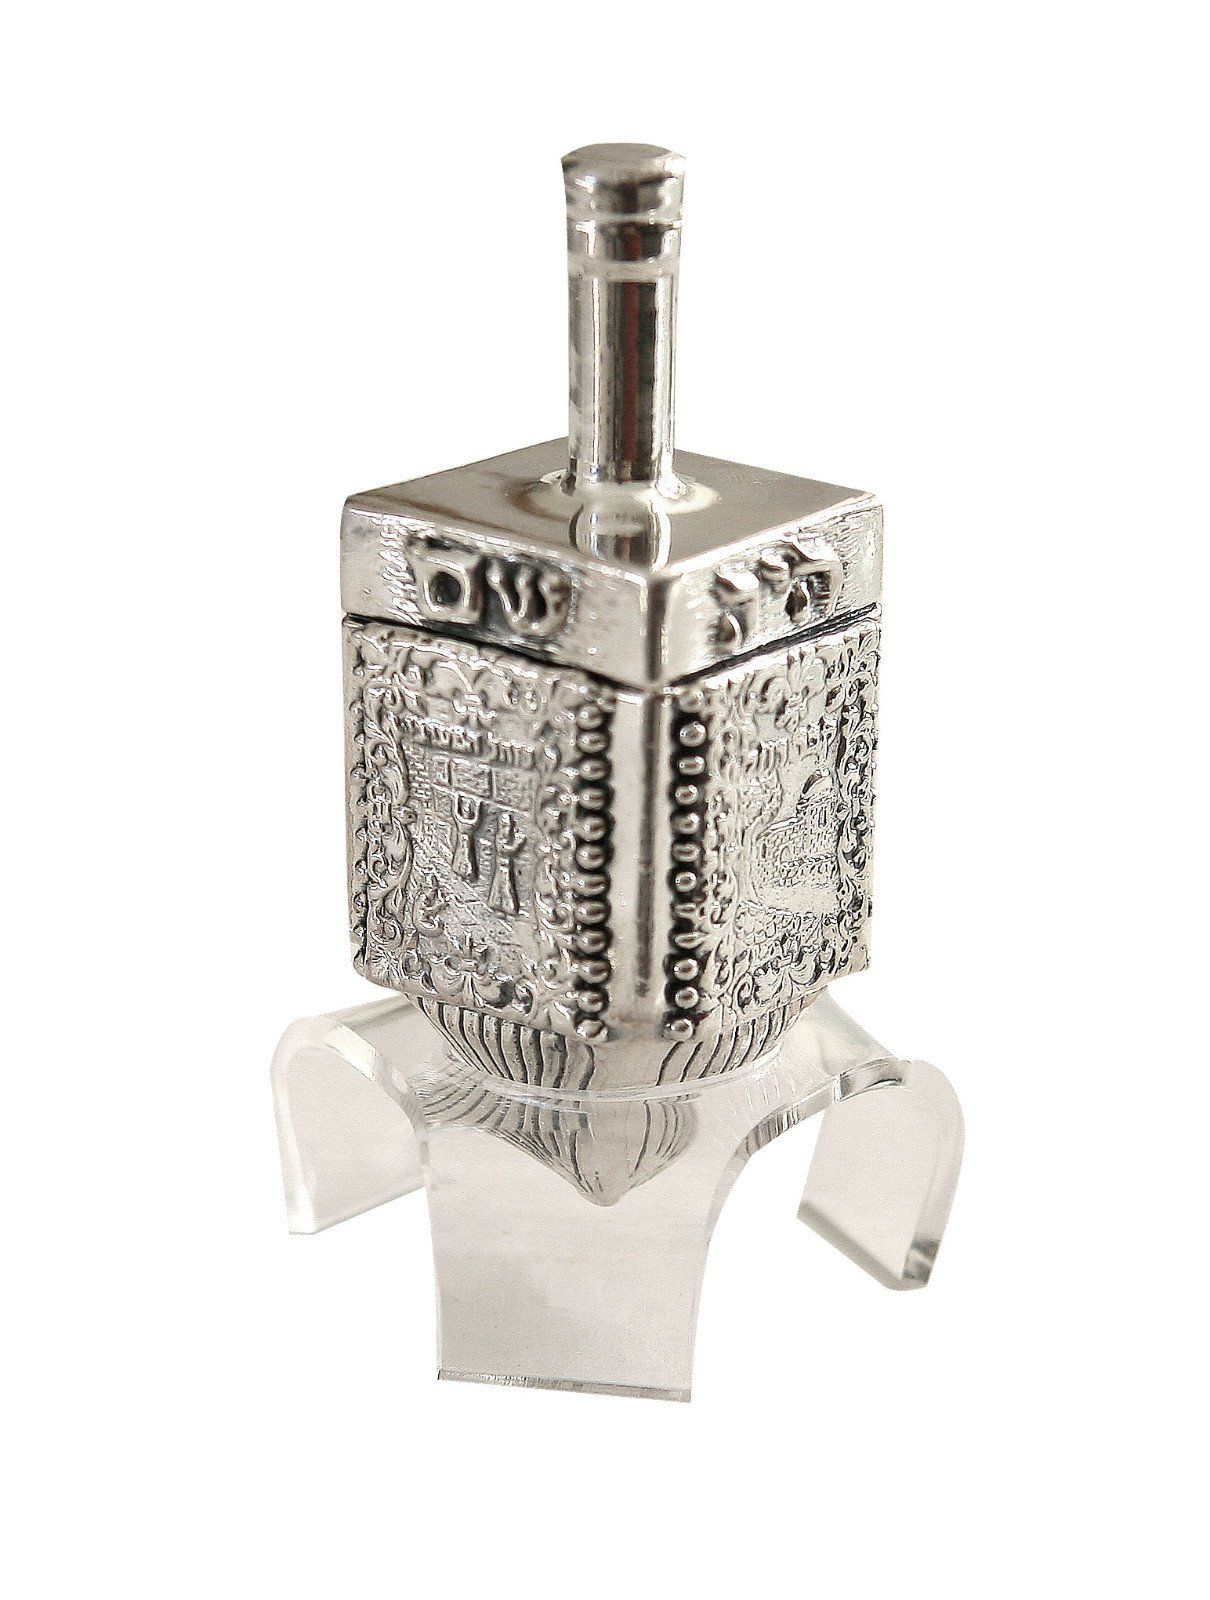 Hanukkah Chanukka Big Dreidel 925 Sterling Silver, Old Jerusalem Skyline Hand Made Size: 4.0'' x 1.25'' Stand Optional by Judaica (Image #1)